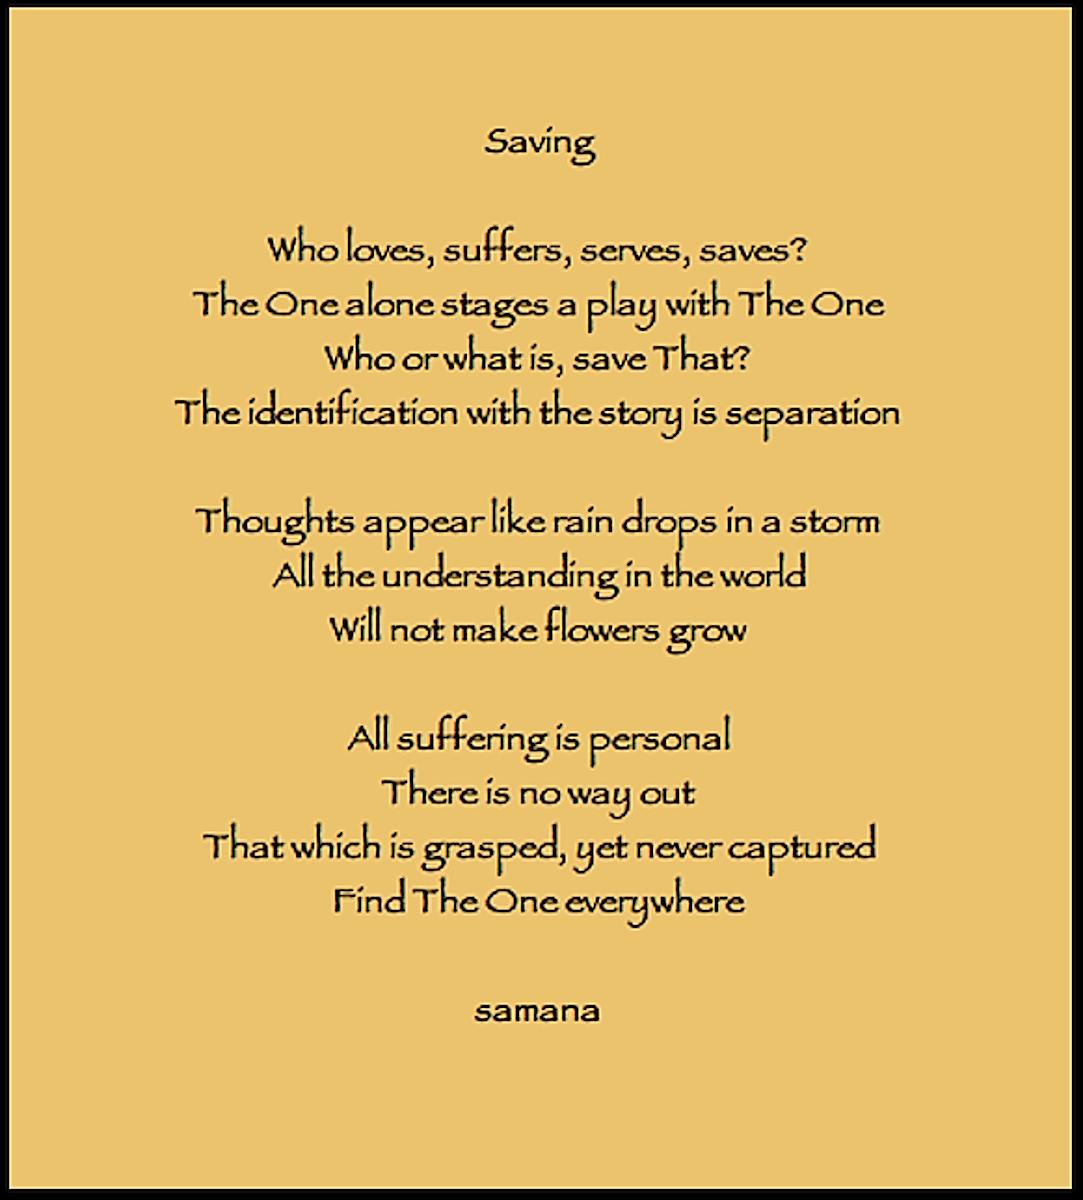 Saving©samana.png